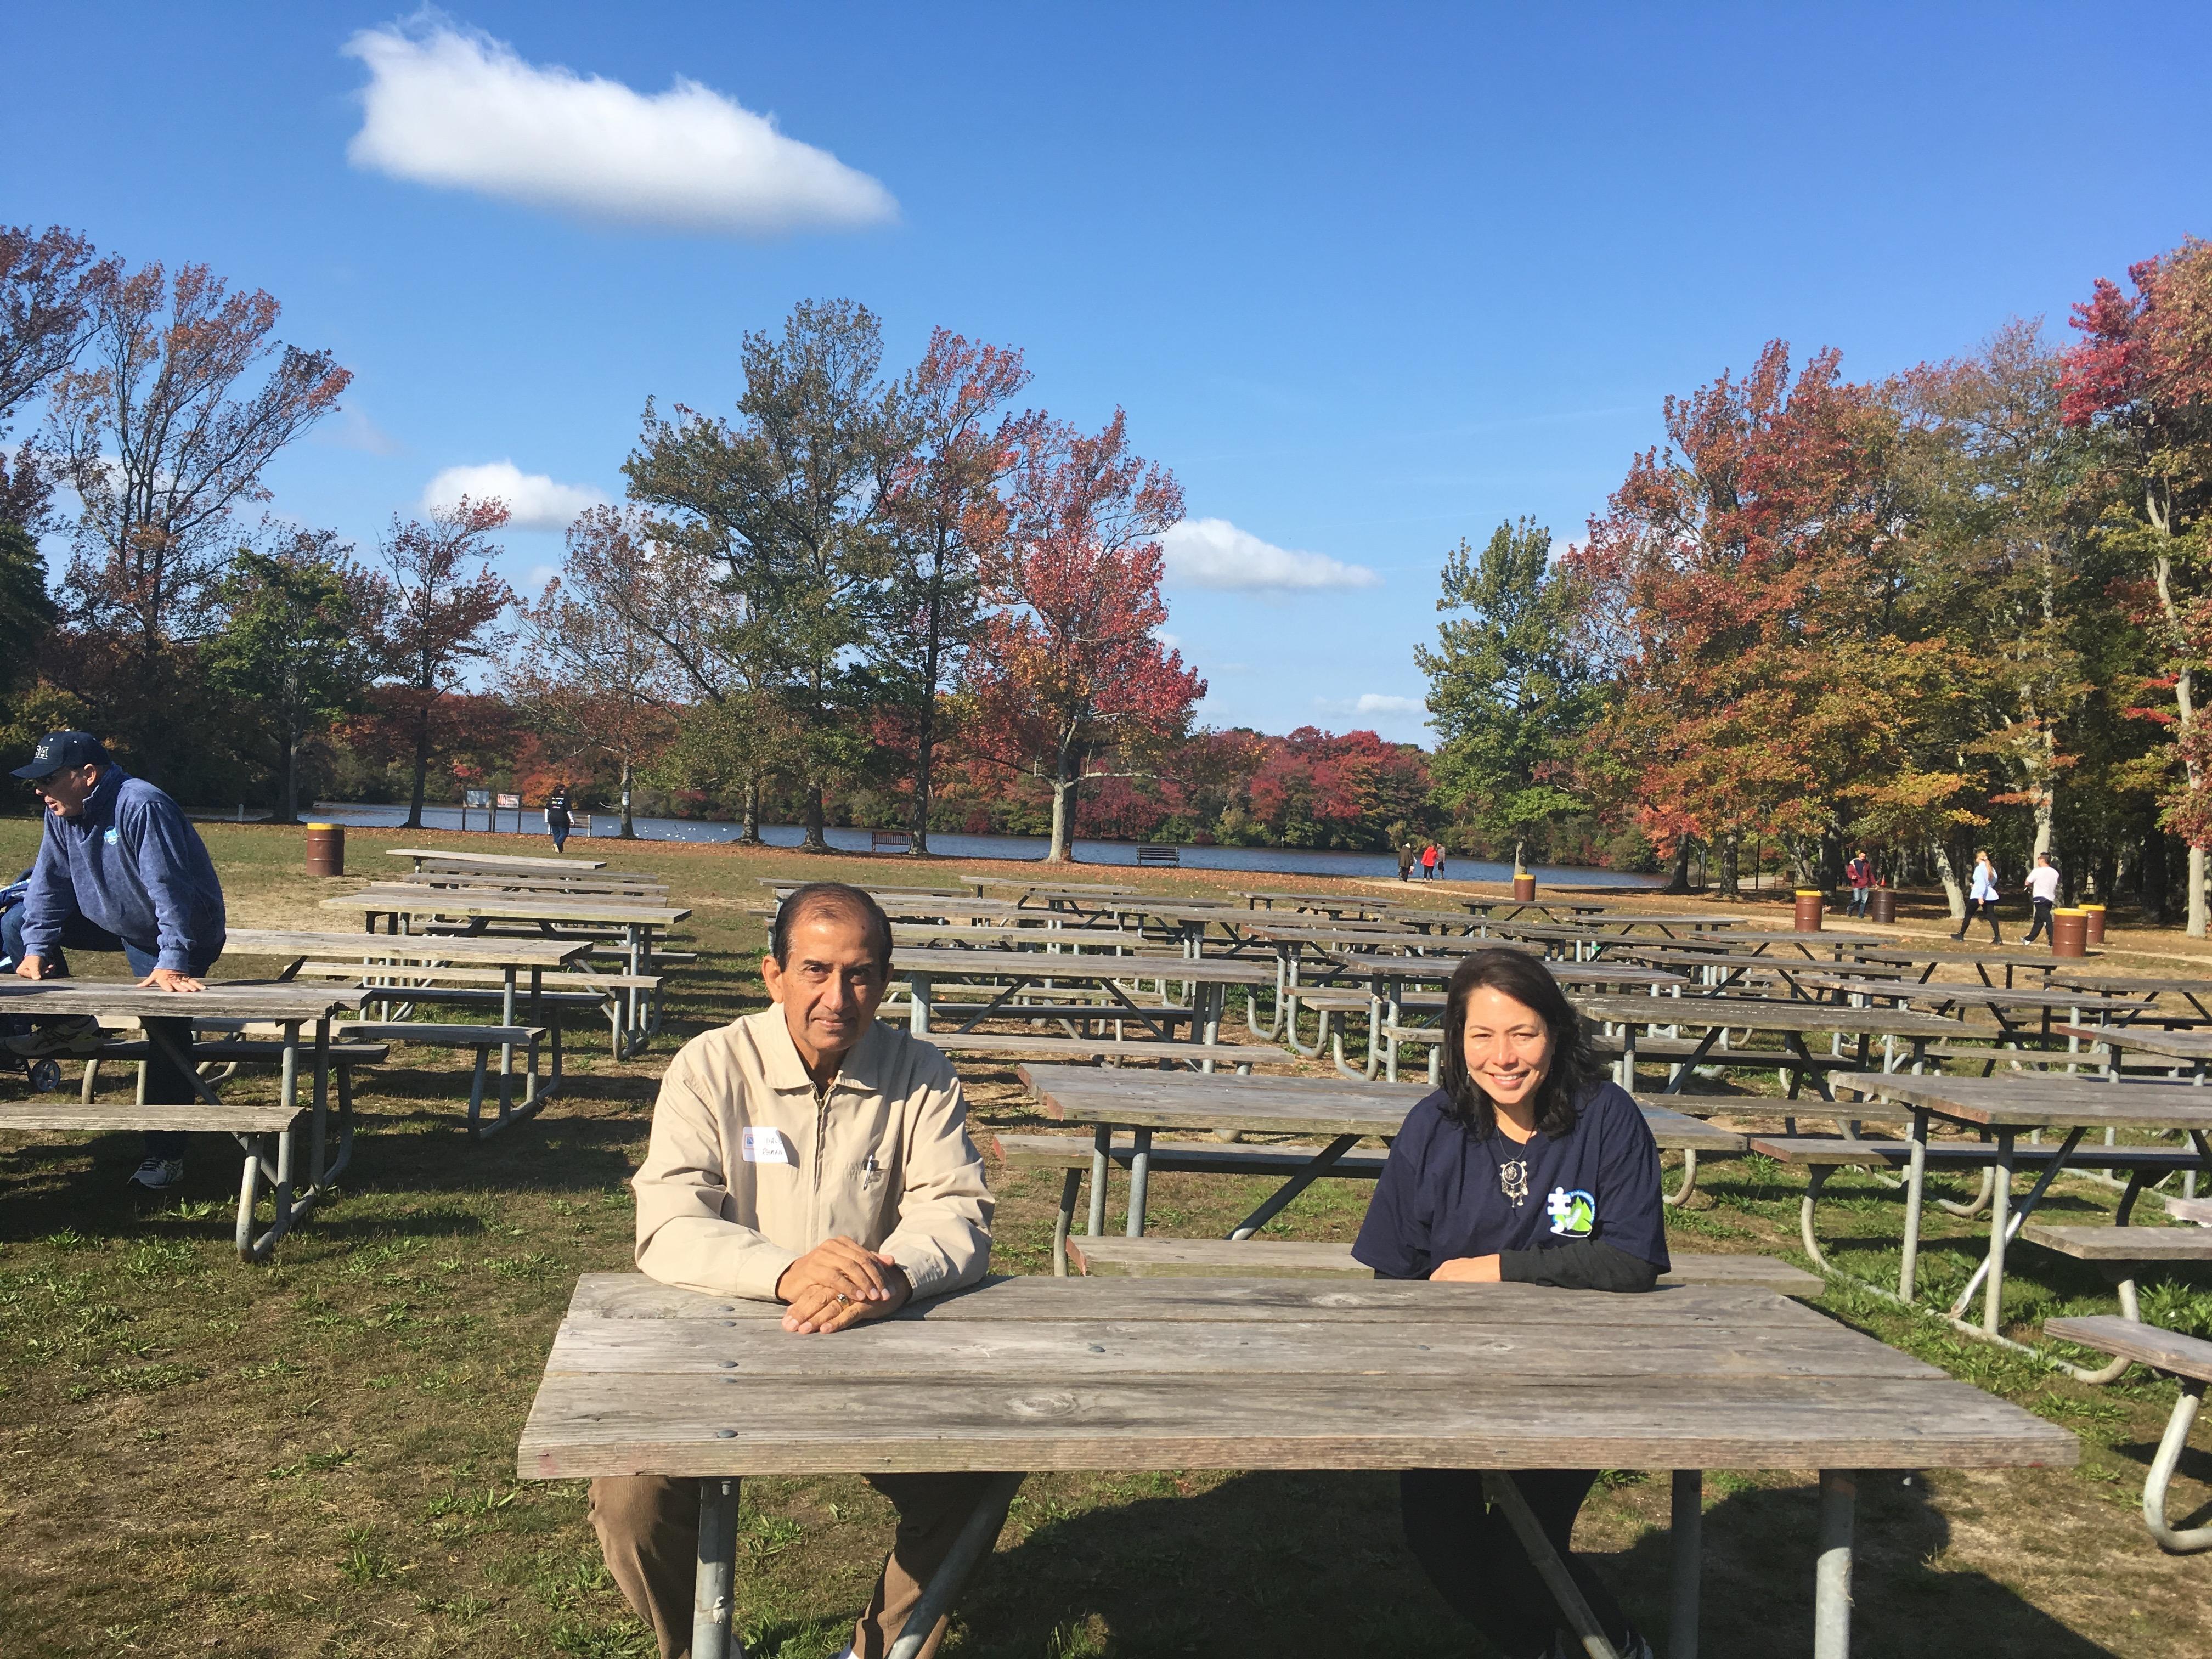 Khalid Rehman and Mary Hernandez enjoying a well-deserved break